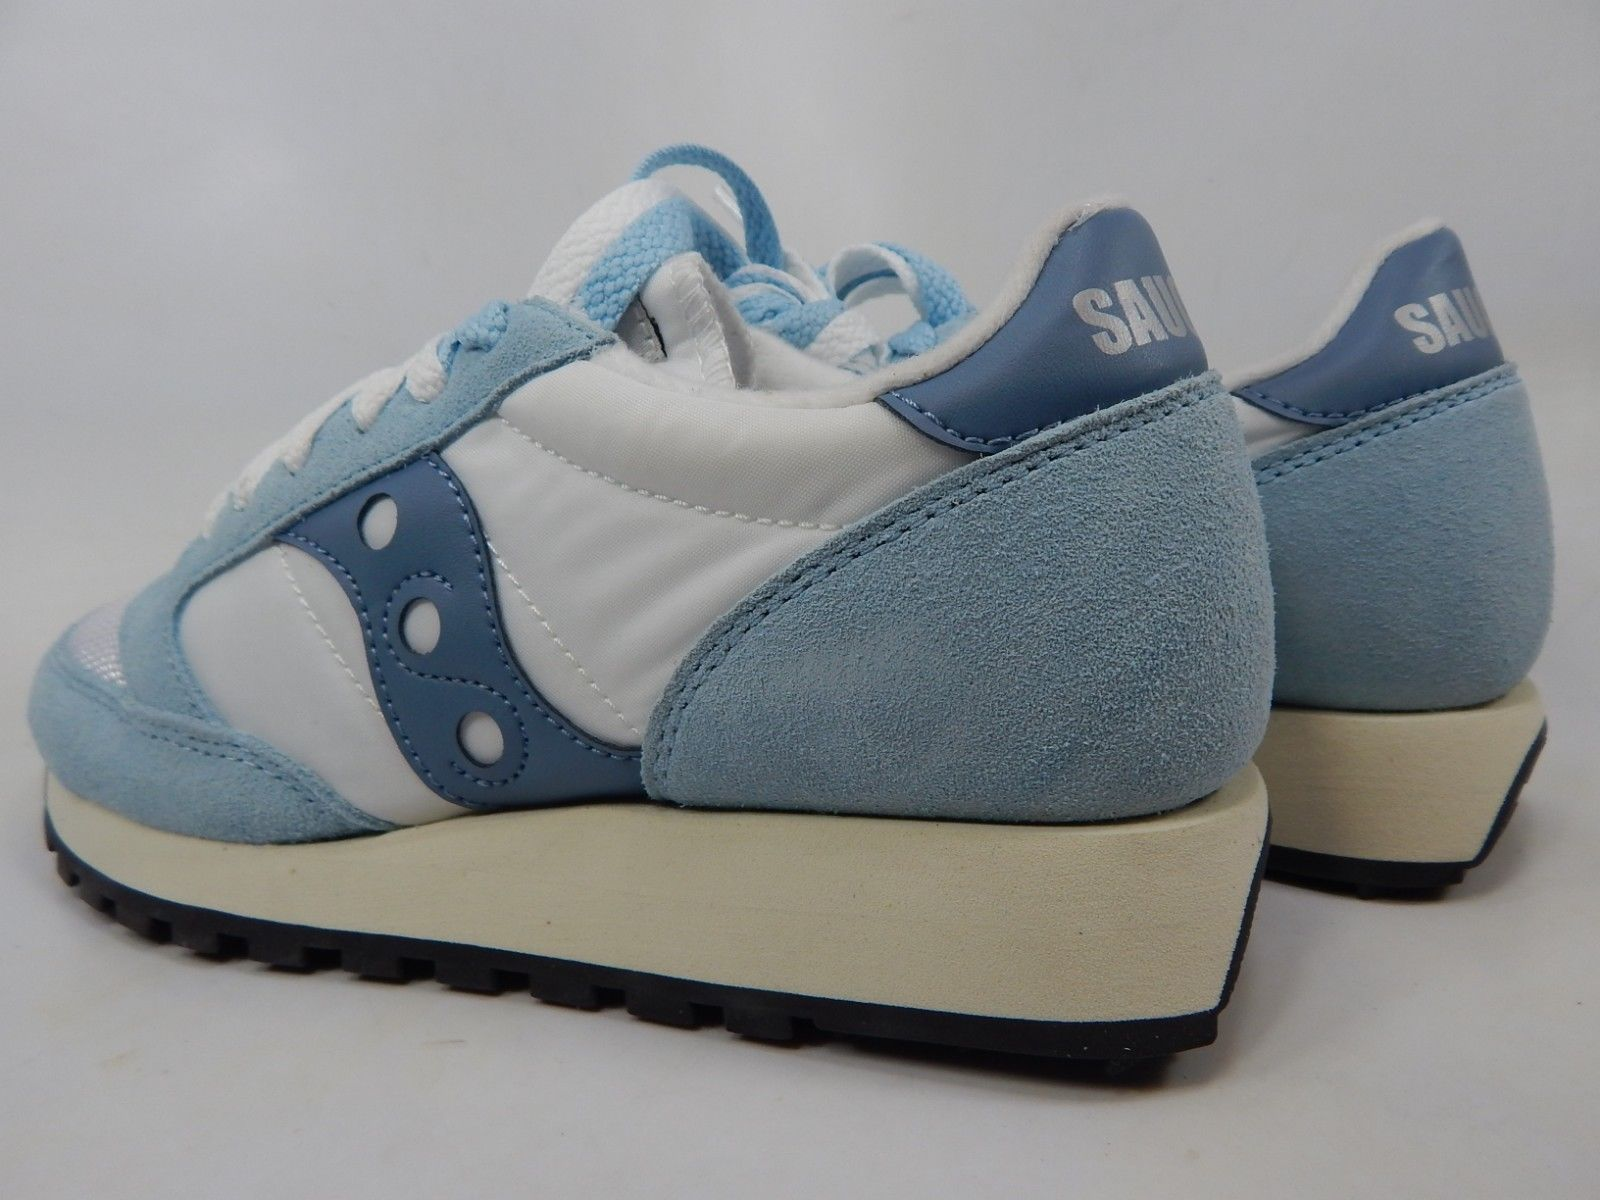 Saucony Jazz Original Vintage SMU S60368-25 Women's Shoes Size 7 M (B) EU 38